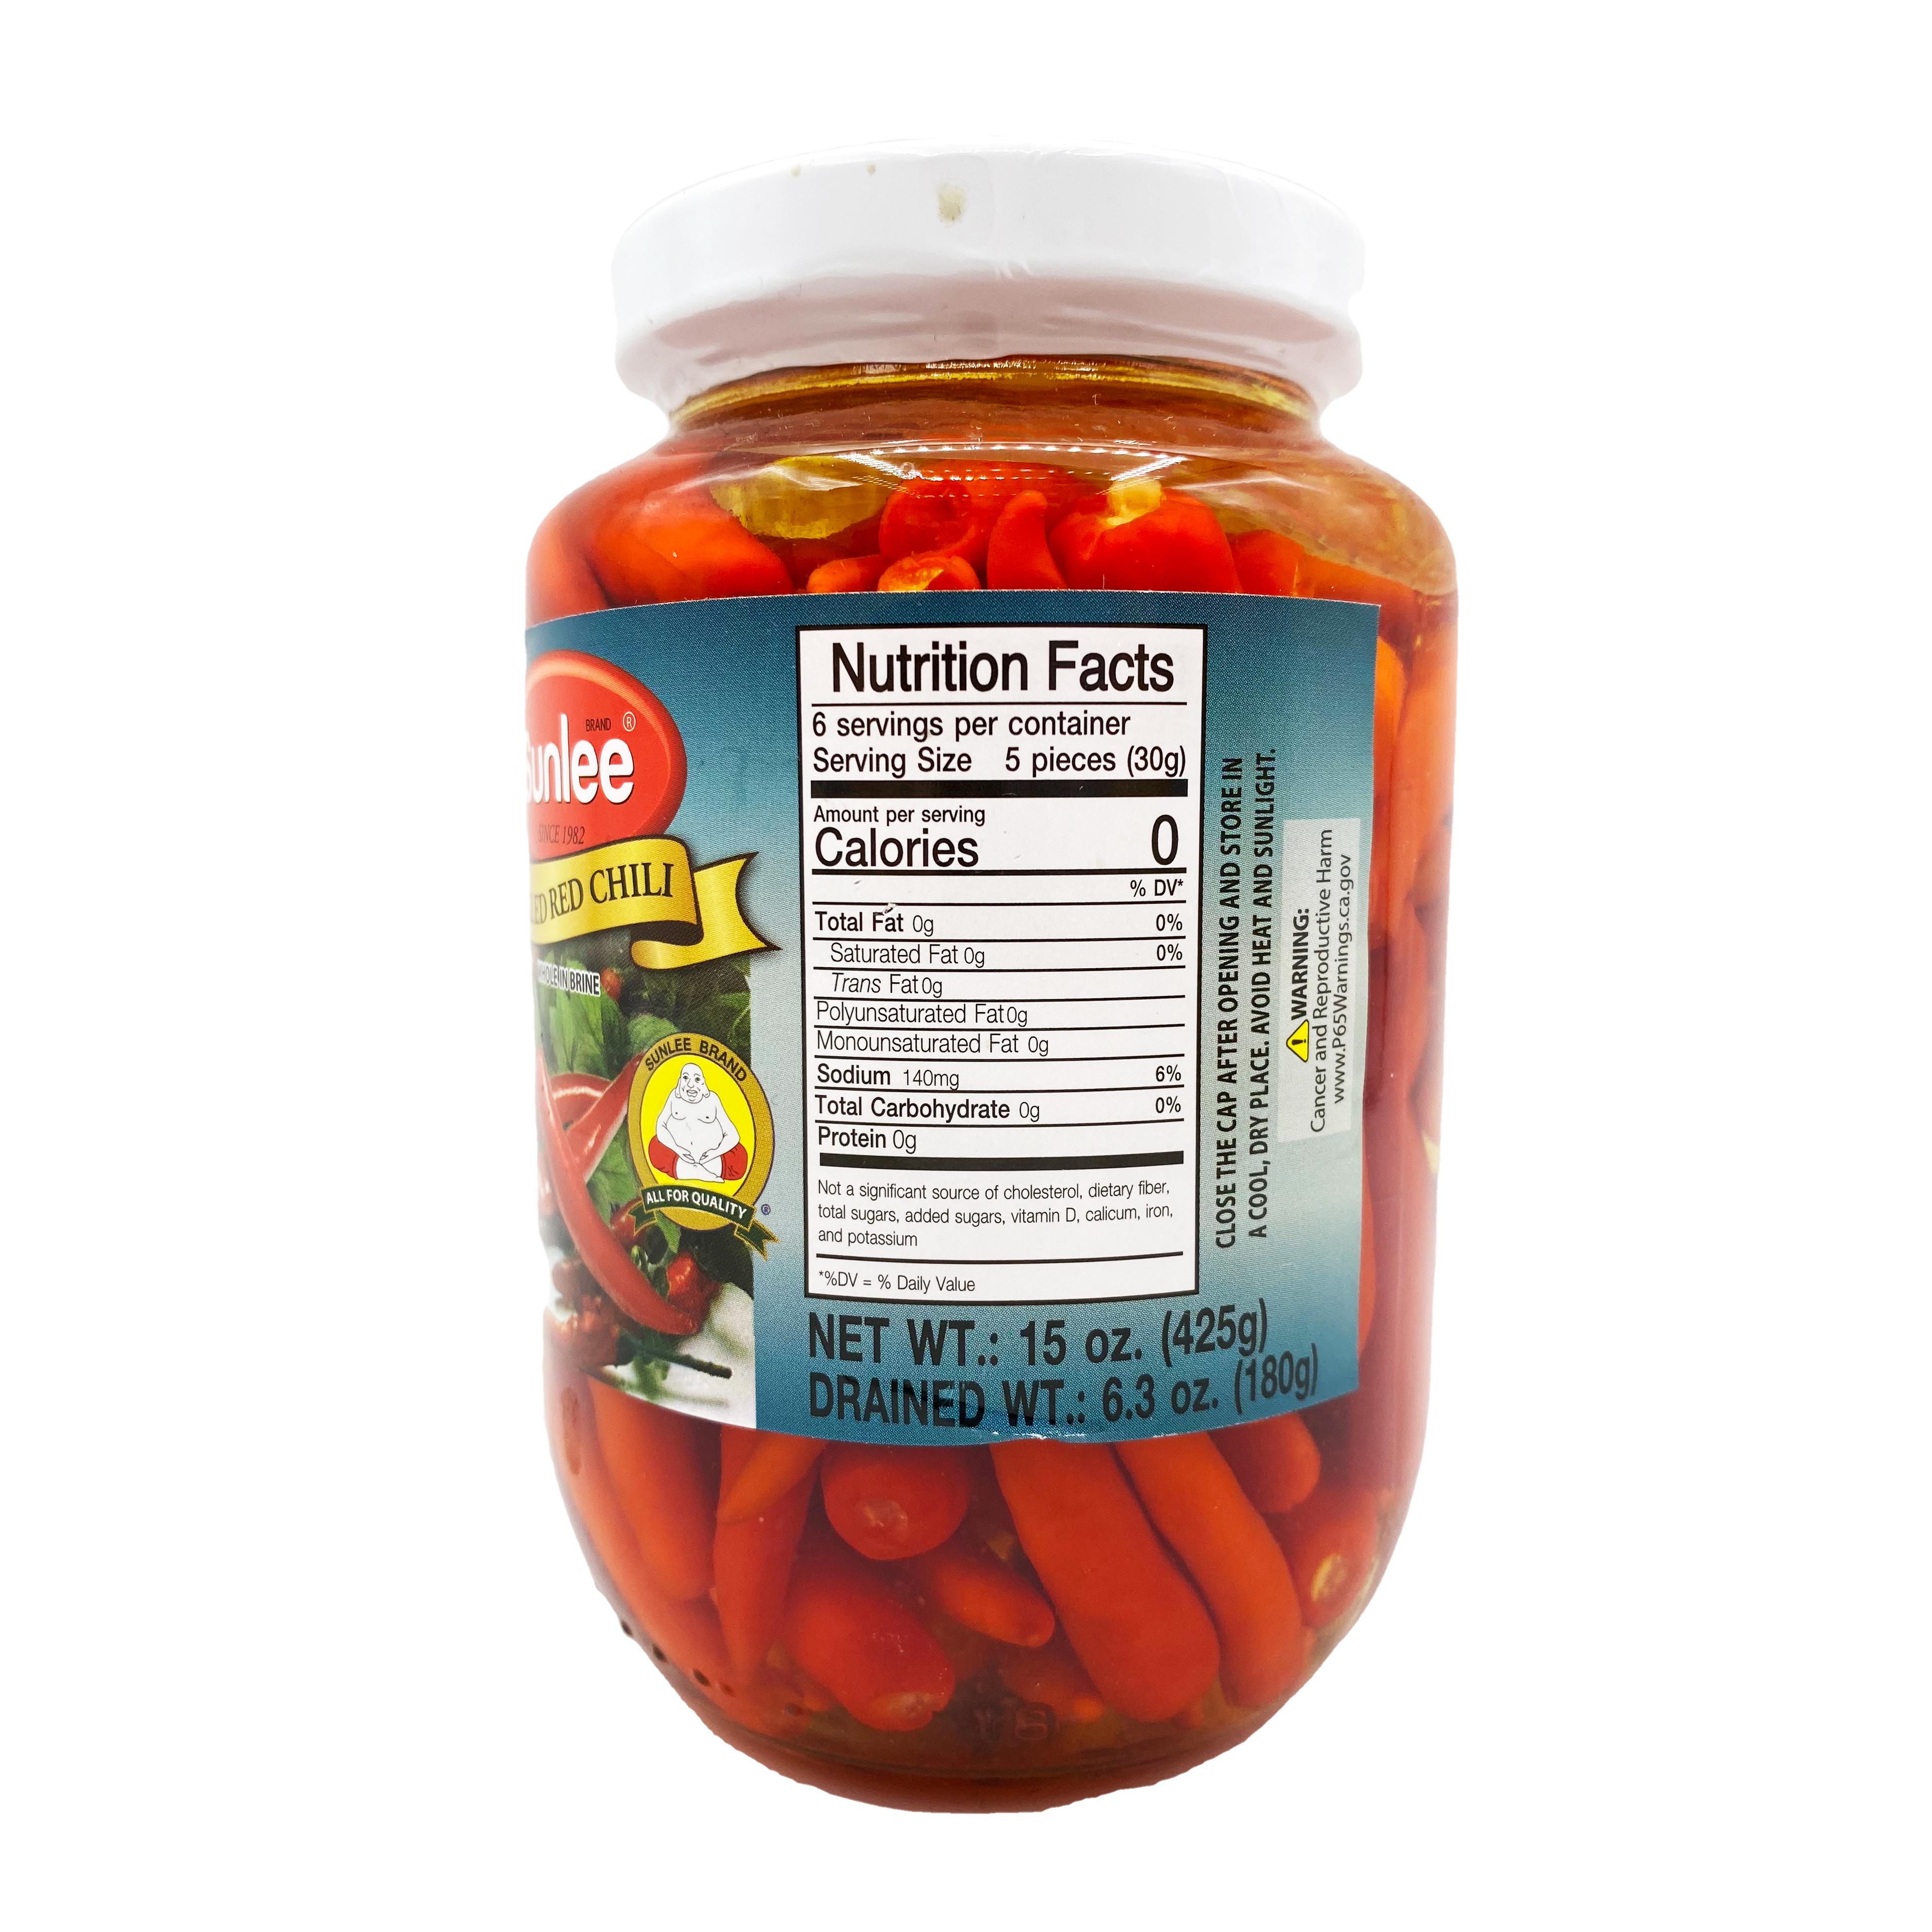 SUNLEE Pickled Red Chili In Brine 16 OZ